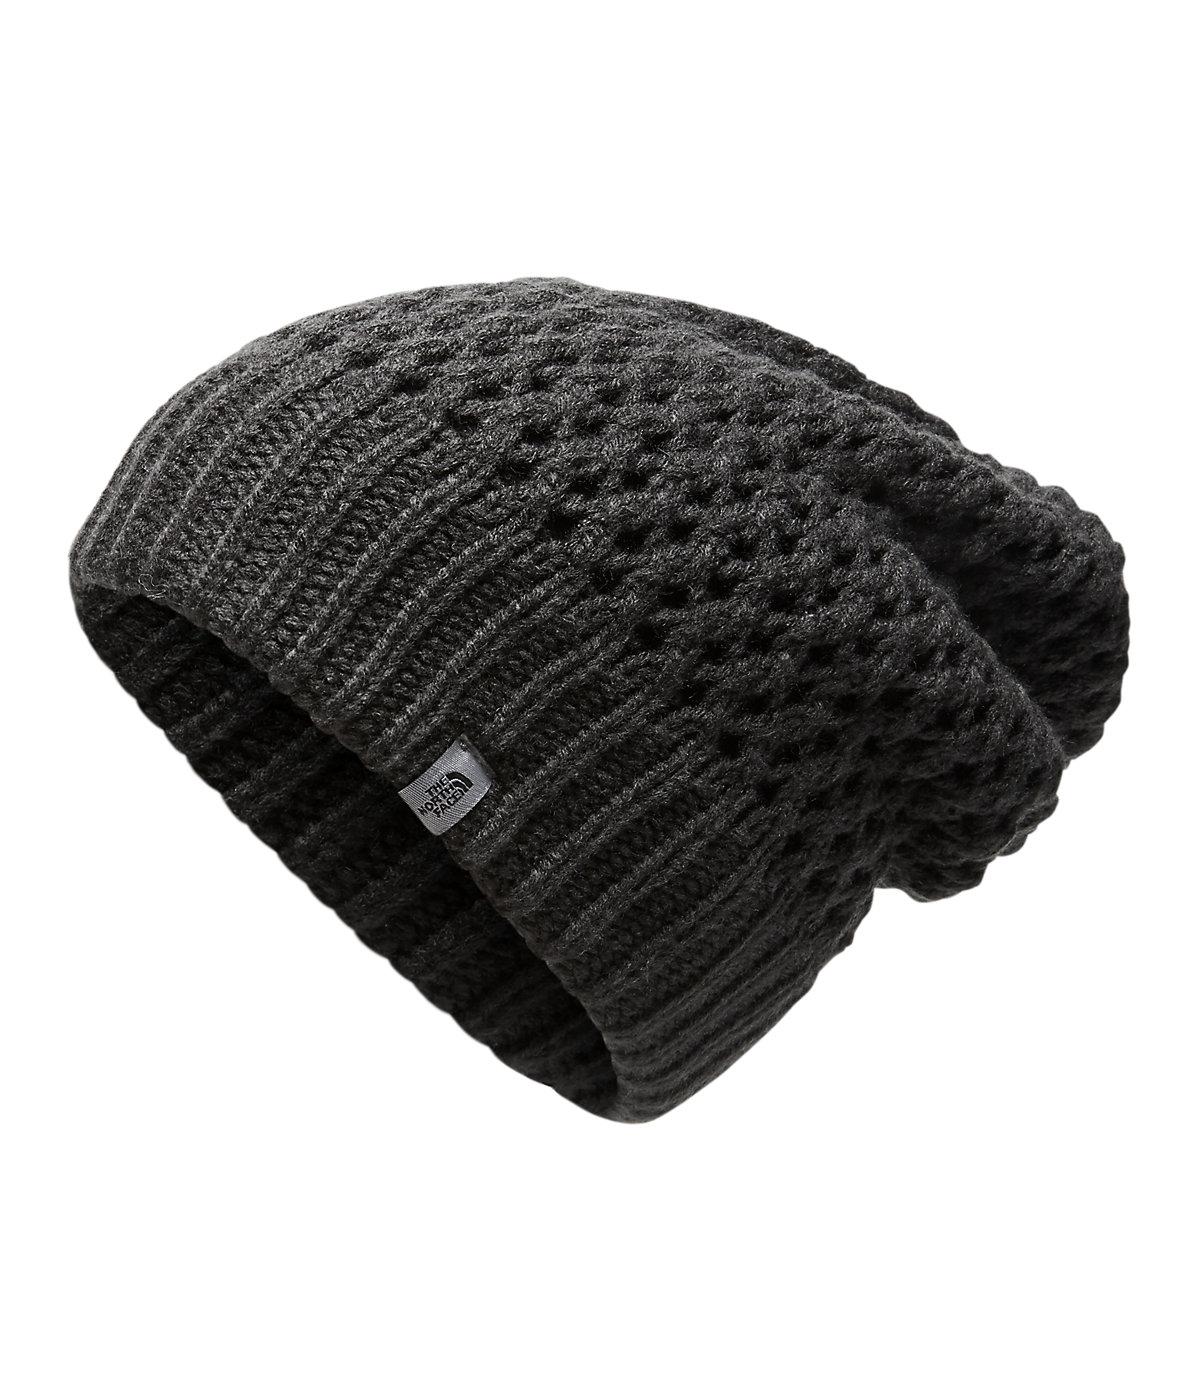 554111691 Shinsky beanie in 2019 | Products | Beanie, Slouchy beanie, Beanie hats